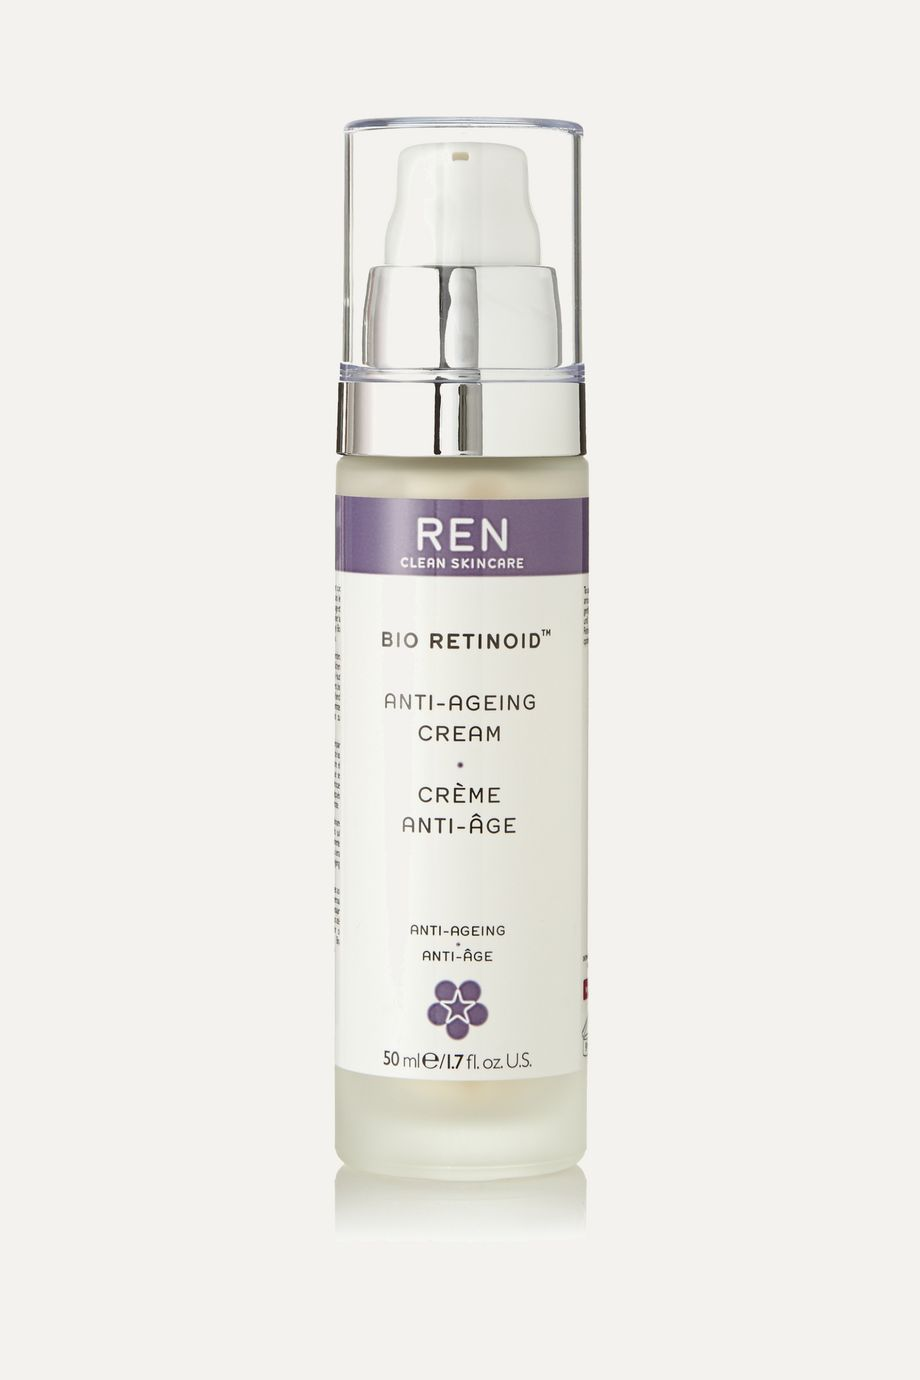 REN Clean Skincare Bio Retinoid Anti-Ageing Cream, 50ml